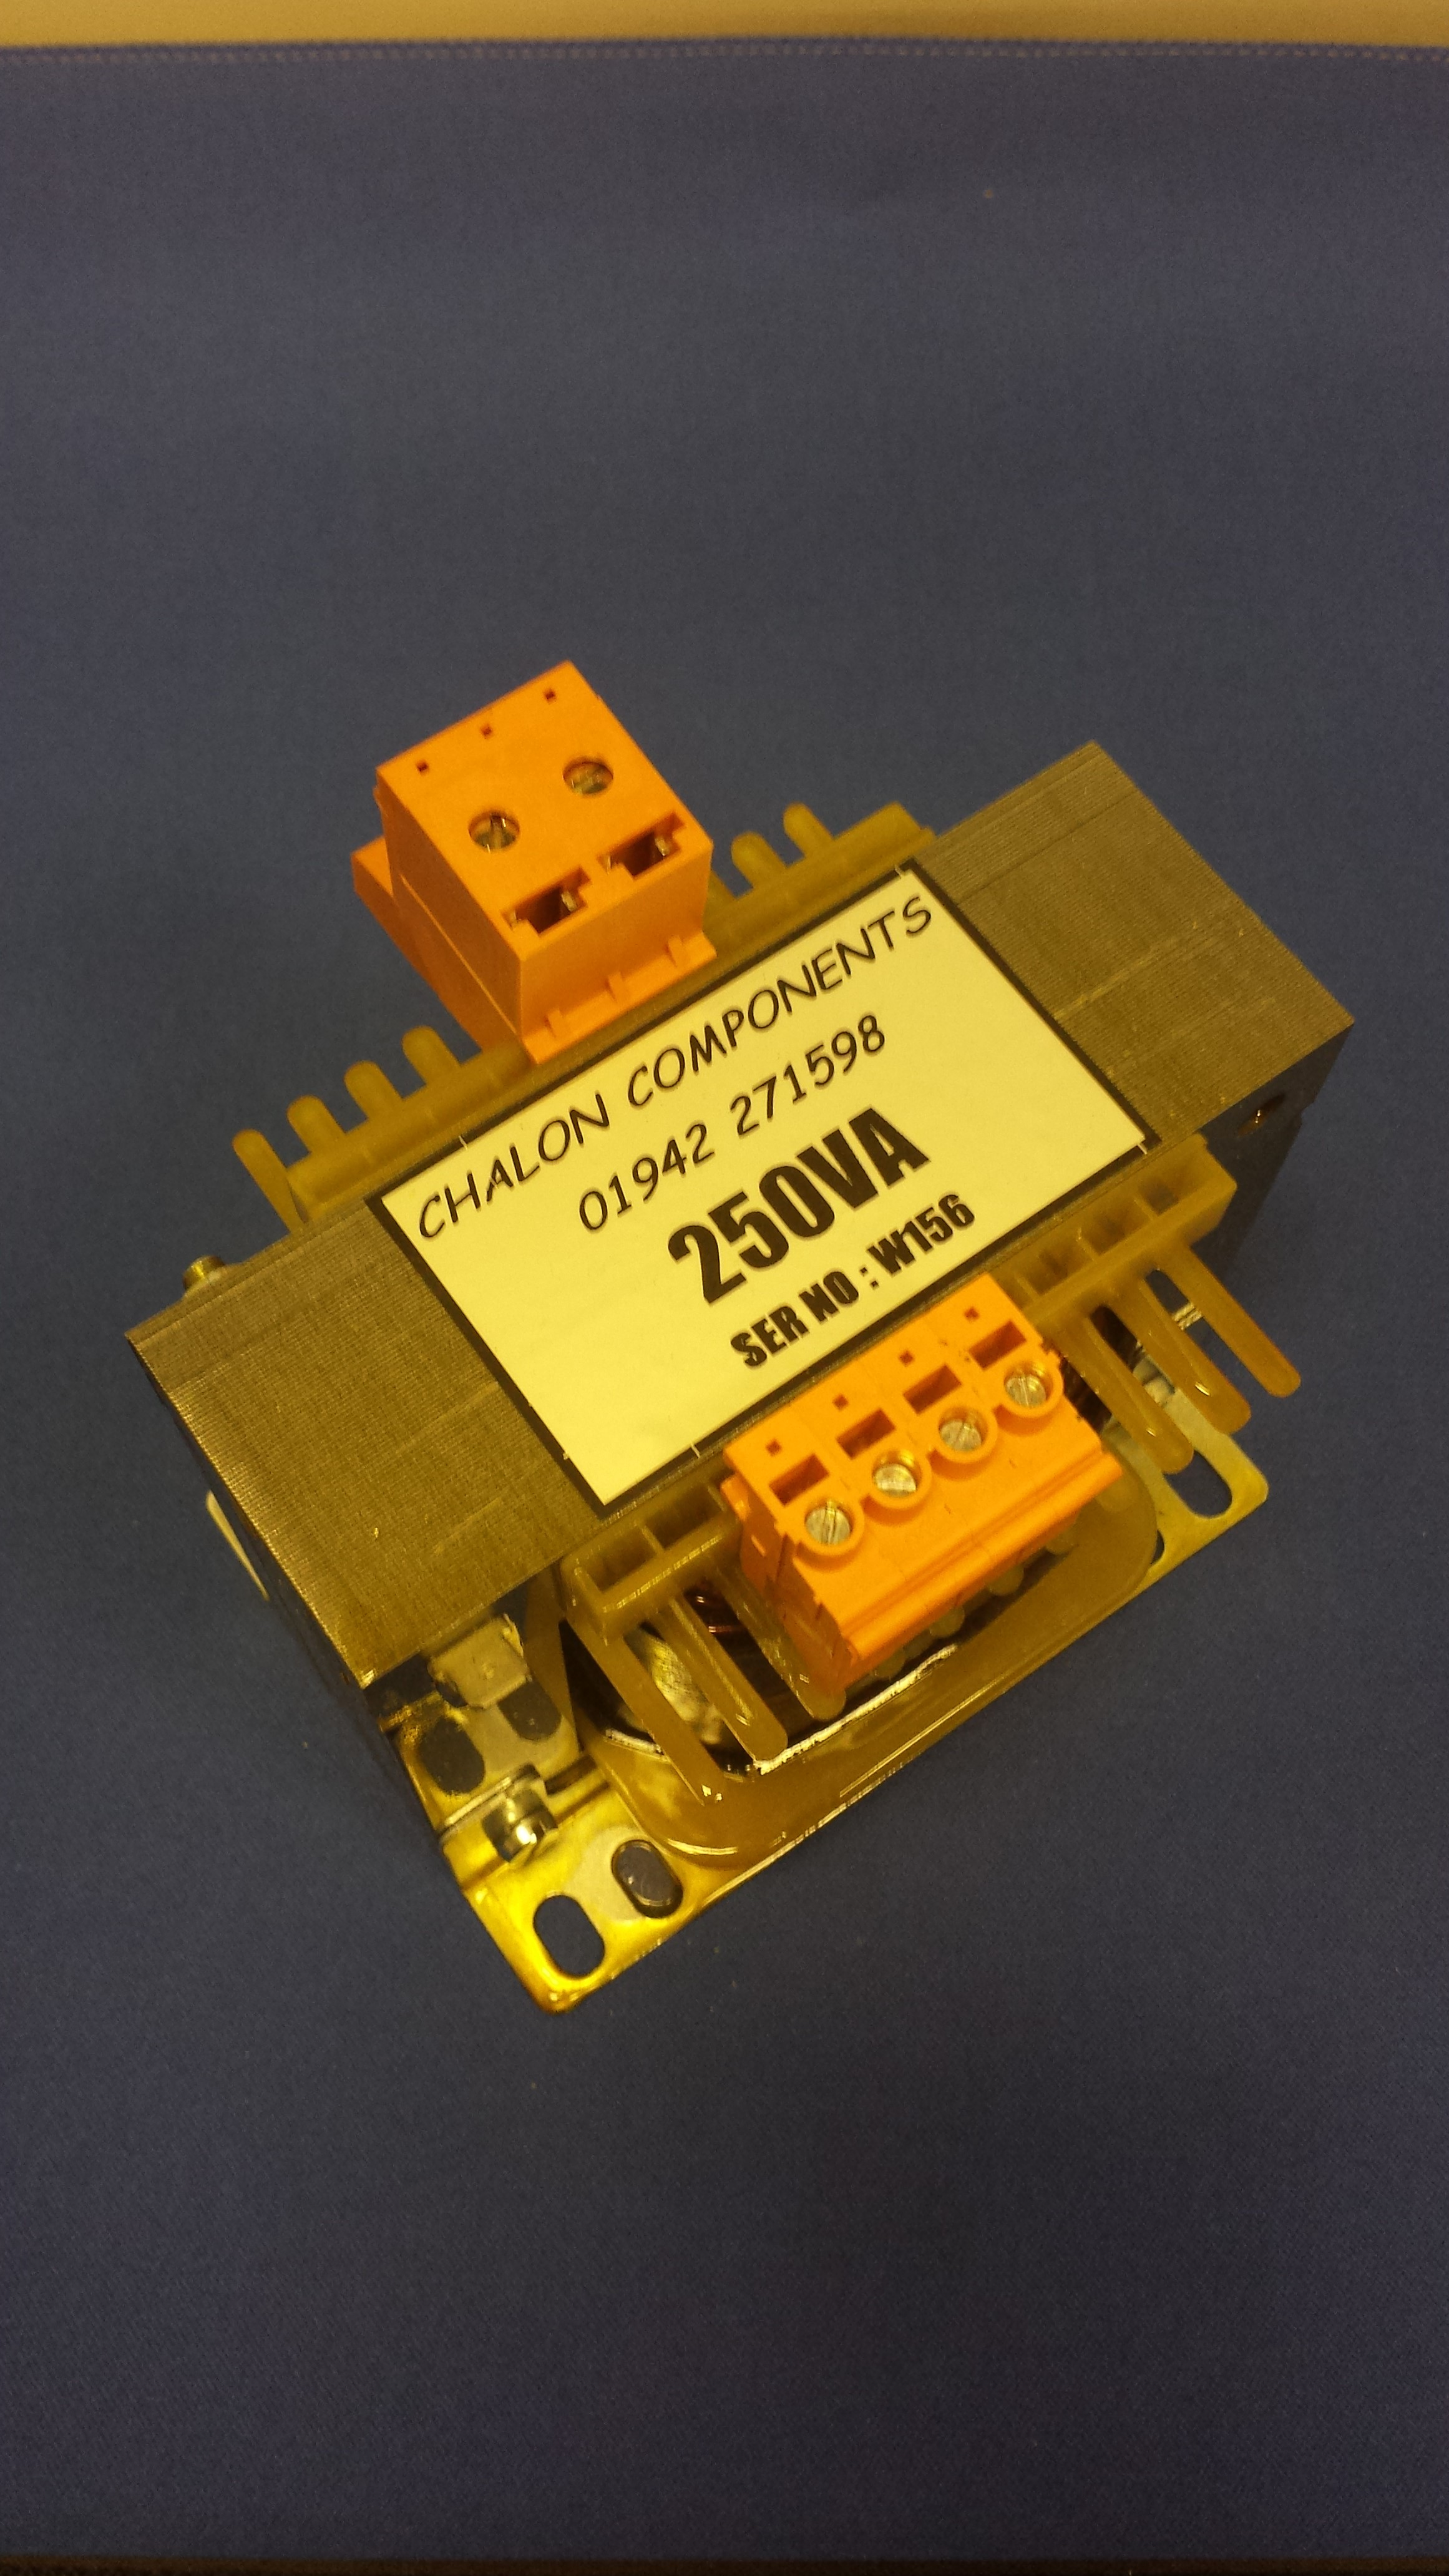 TX-250 1